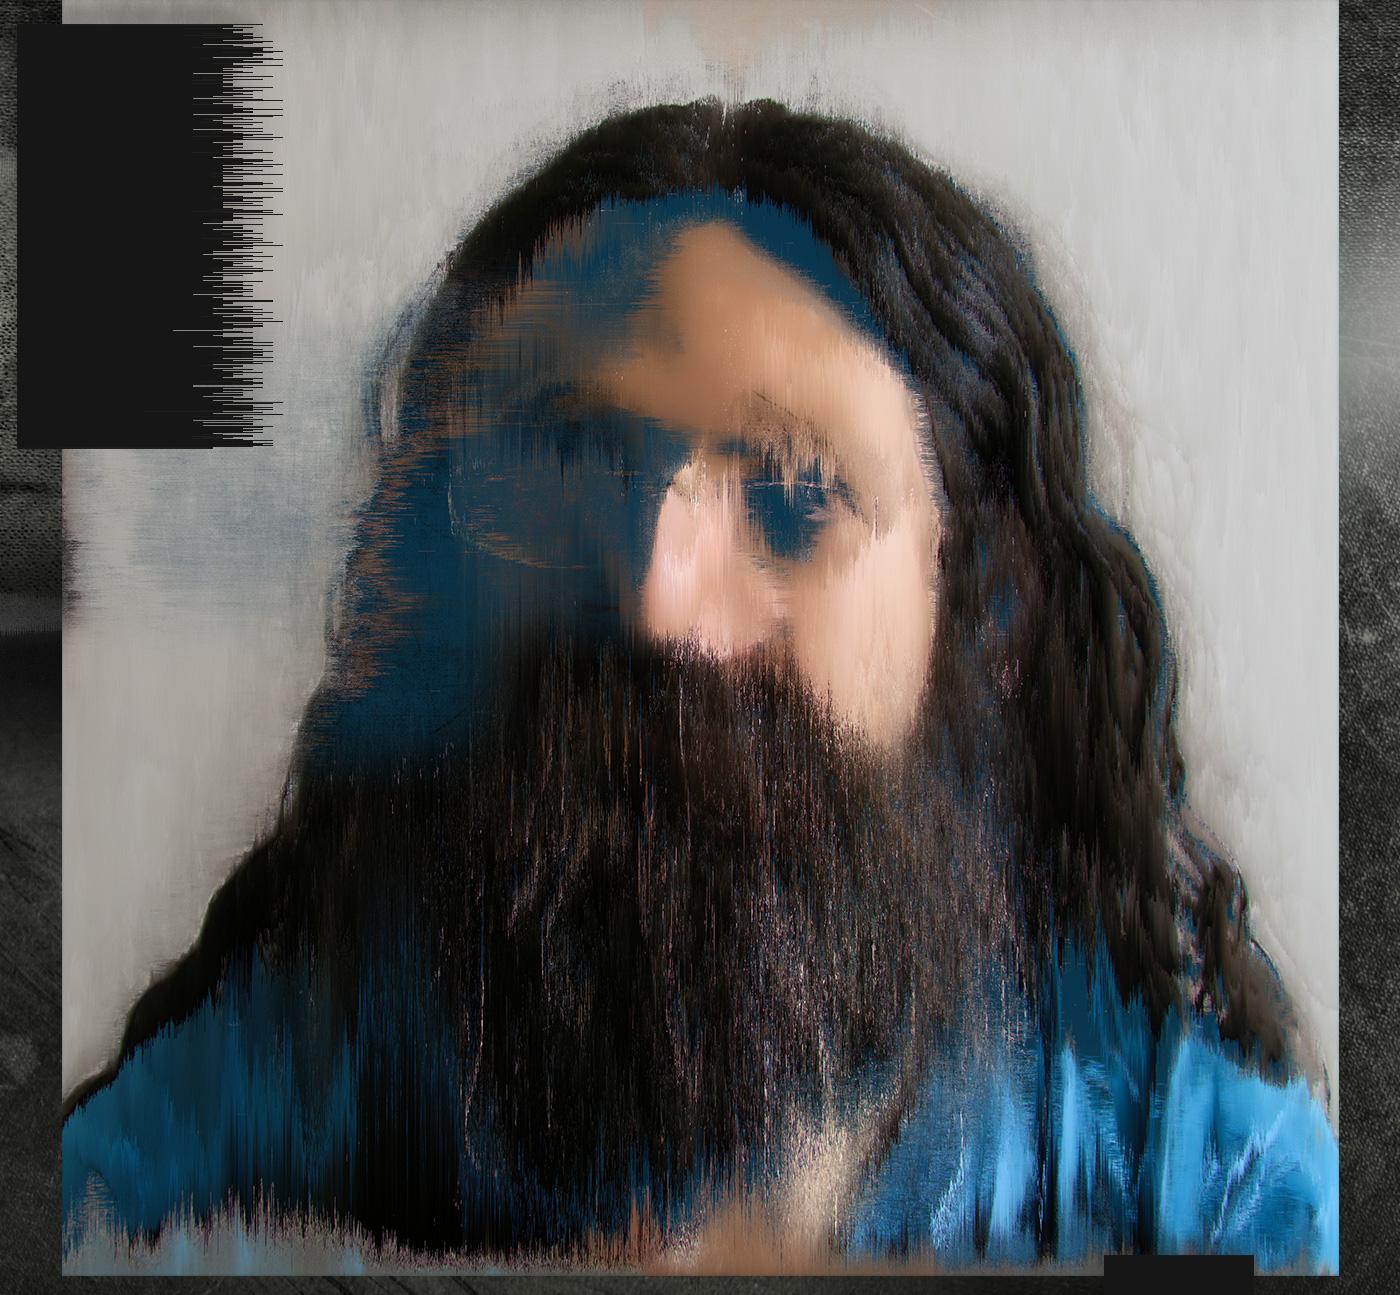 portrait pixel sorting datablending Glitch Renaissance Cyberpunk